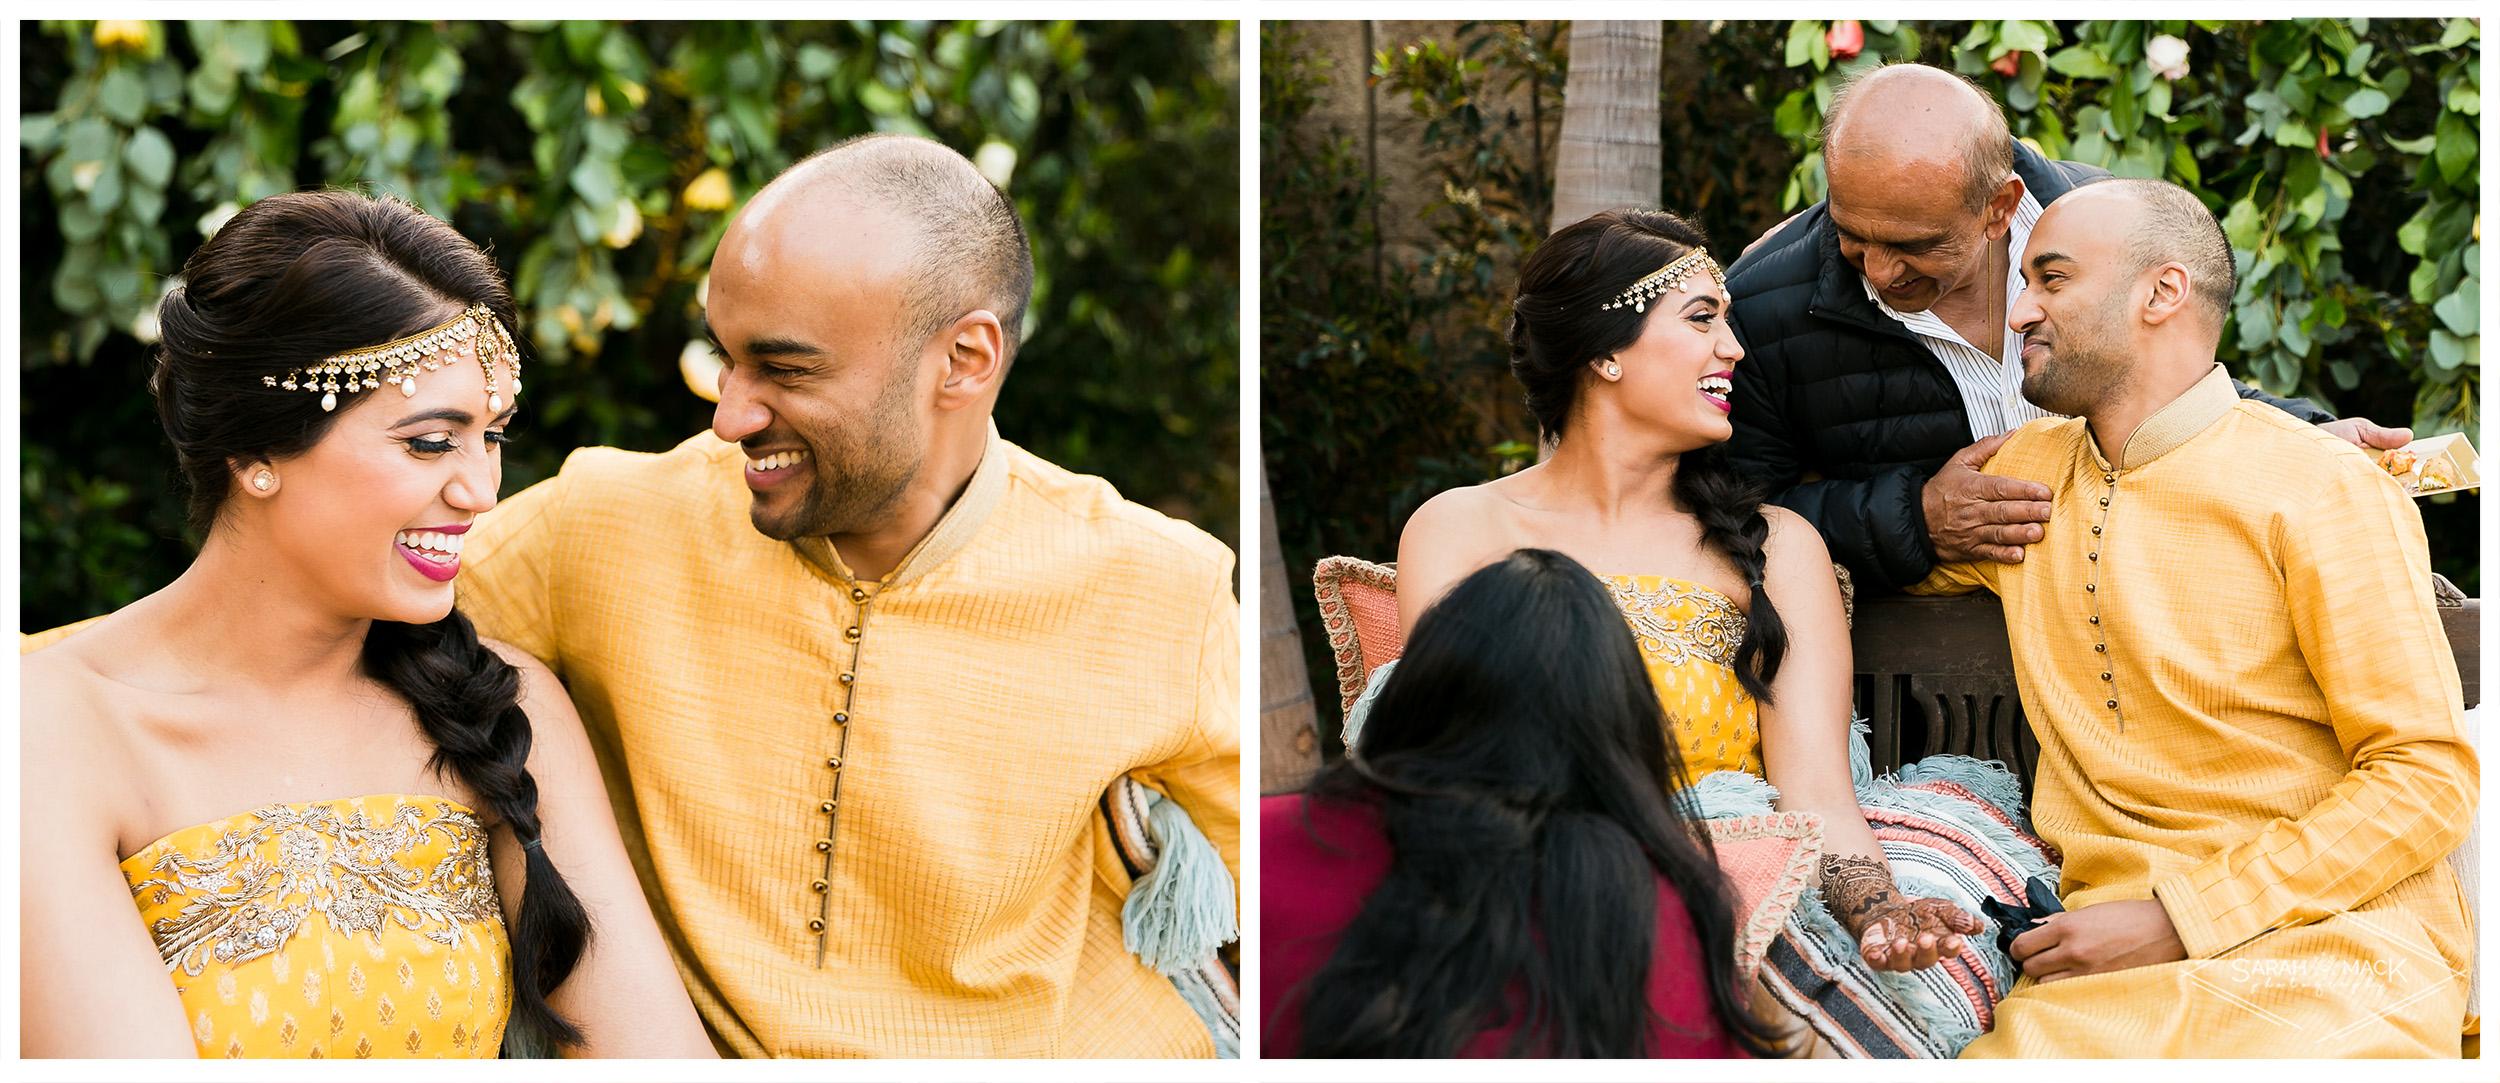 PR-Irvine-Mendhi-Indian-Wedding-Photography-11.jpg